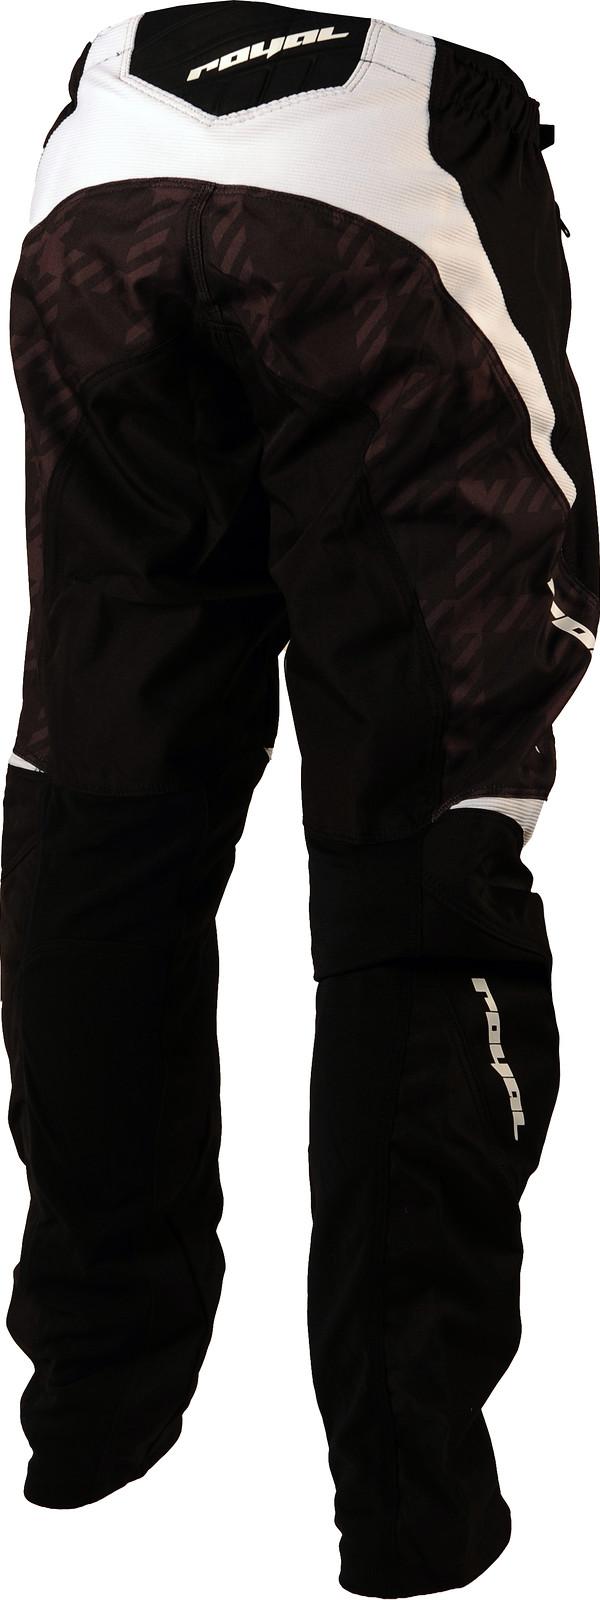 Royal 2011 SP-247 Pants Pants-SP247-Black-Back